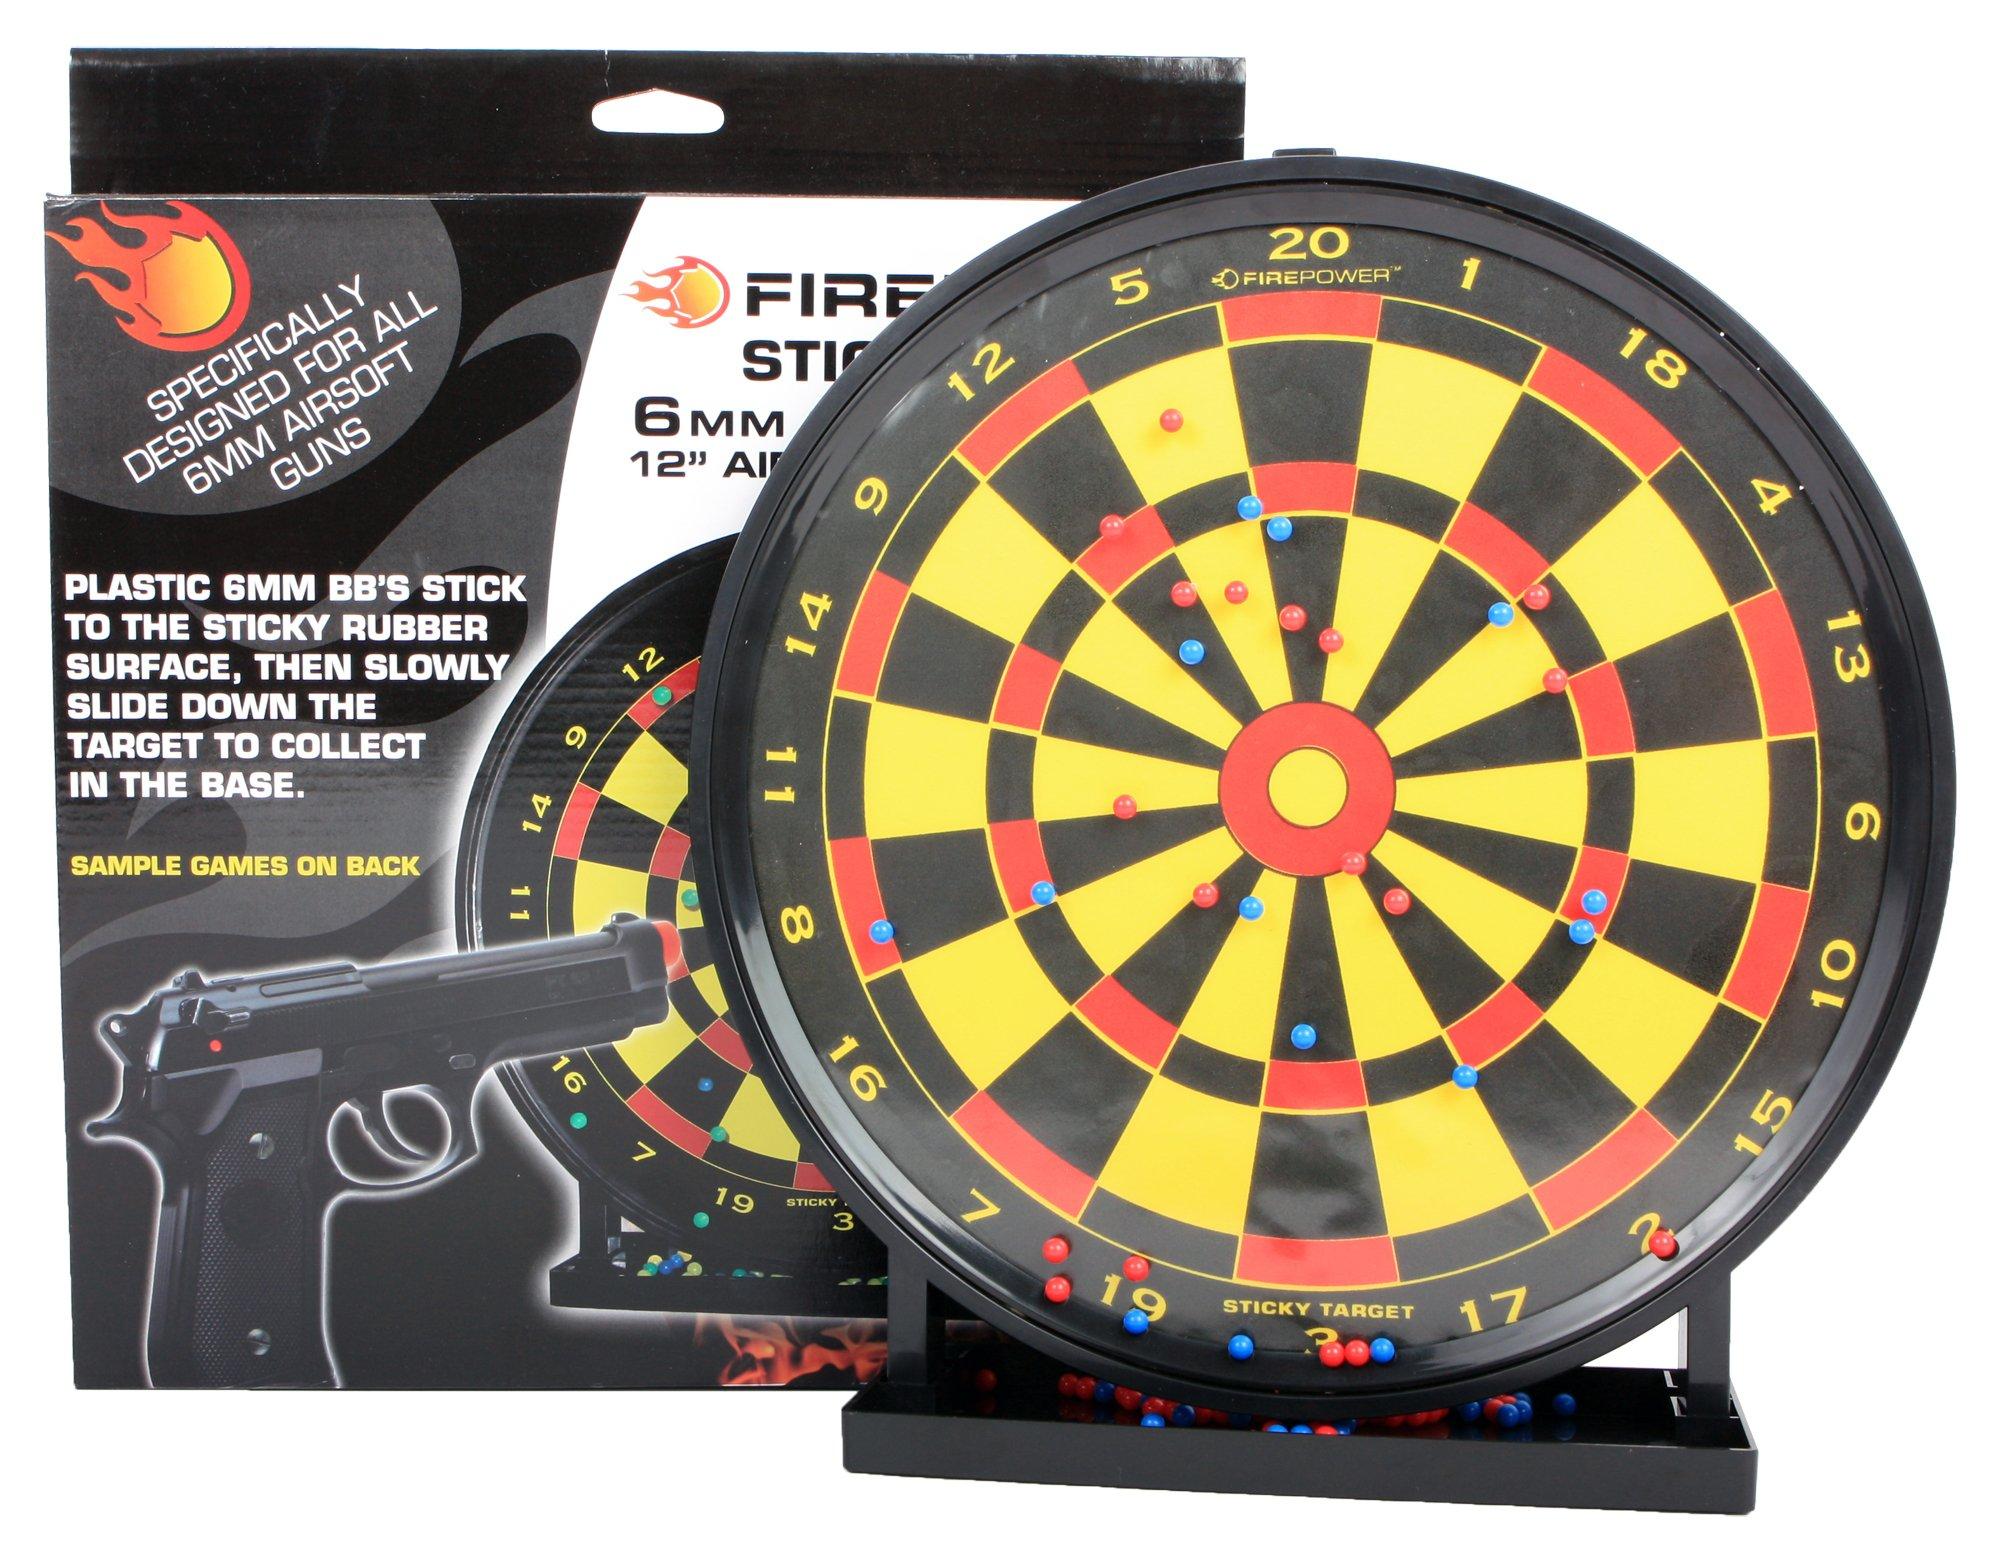 Soft Air Firepower 12-Inch x 12-Inch Dartboard Sticky Target